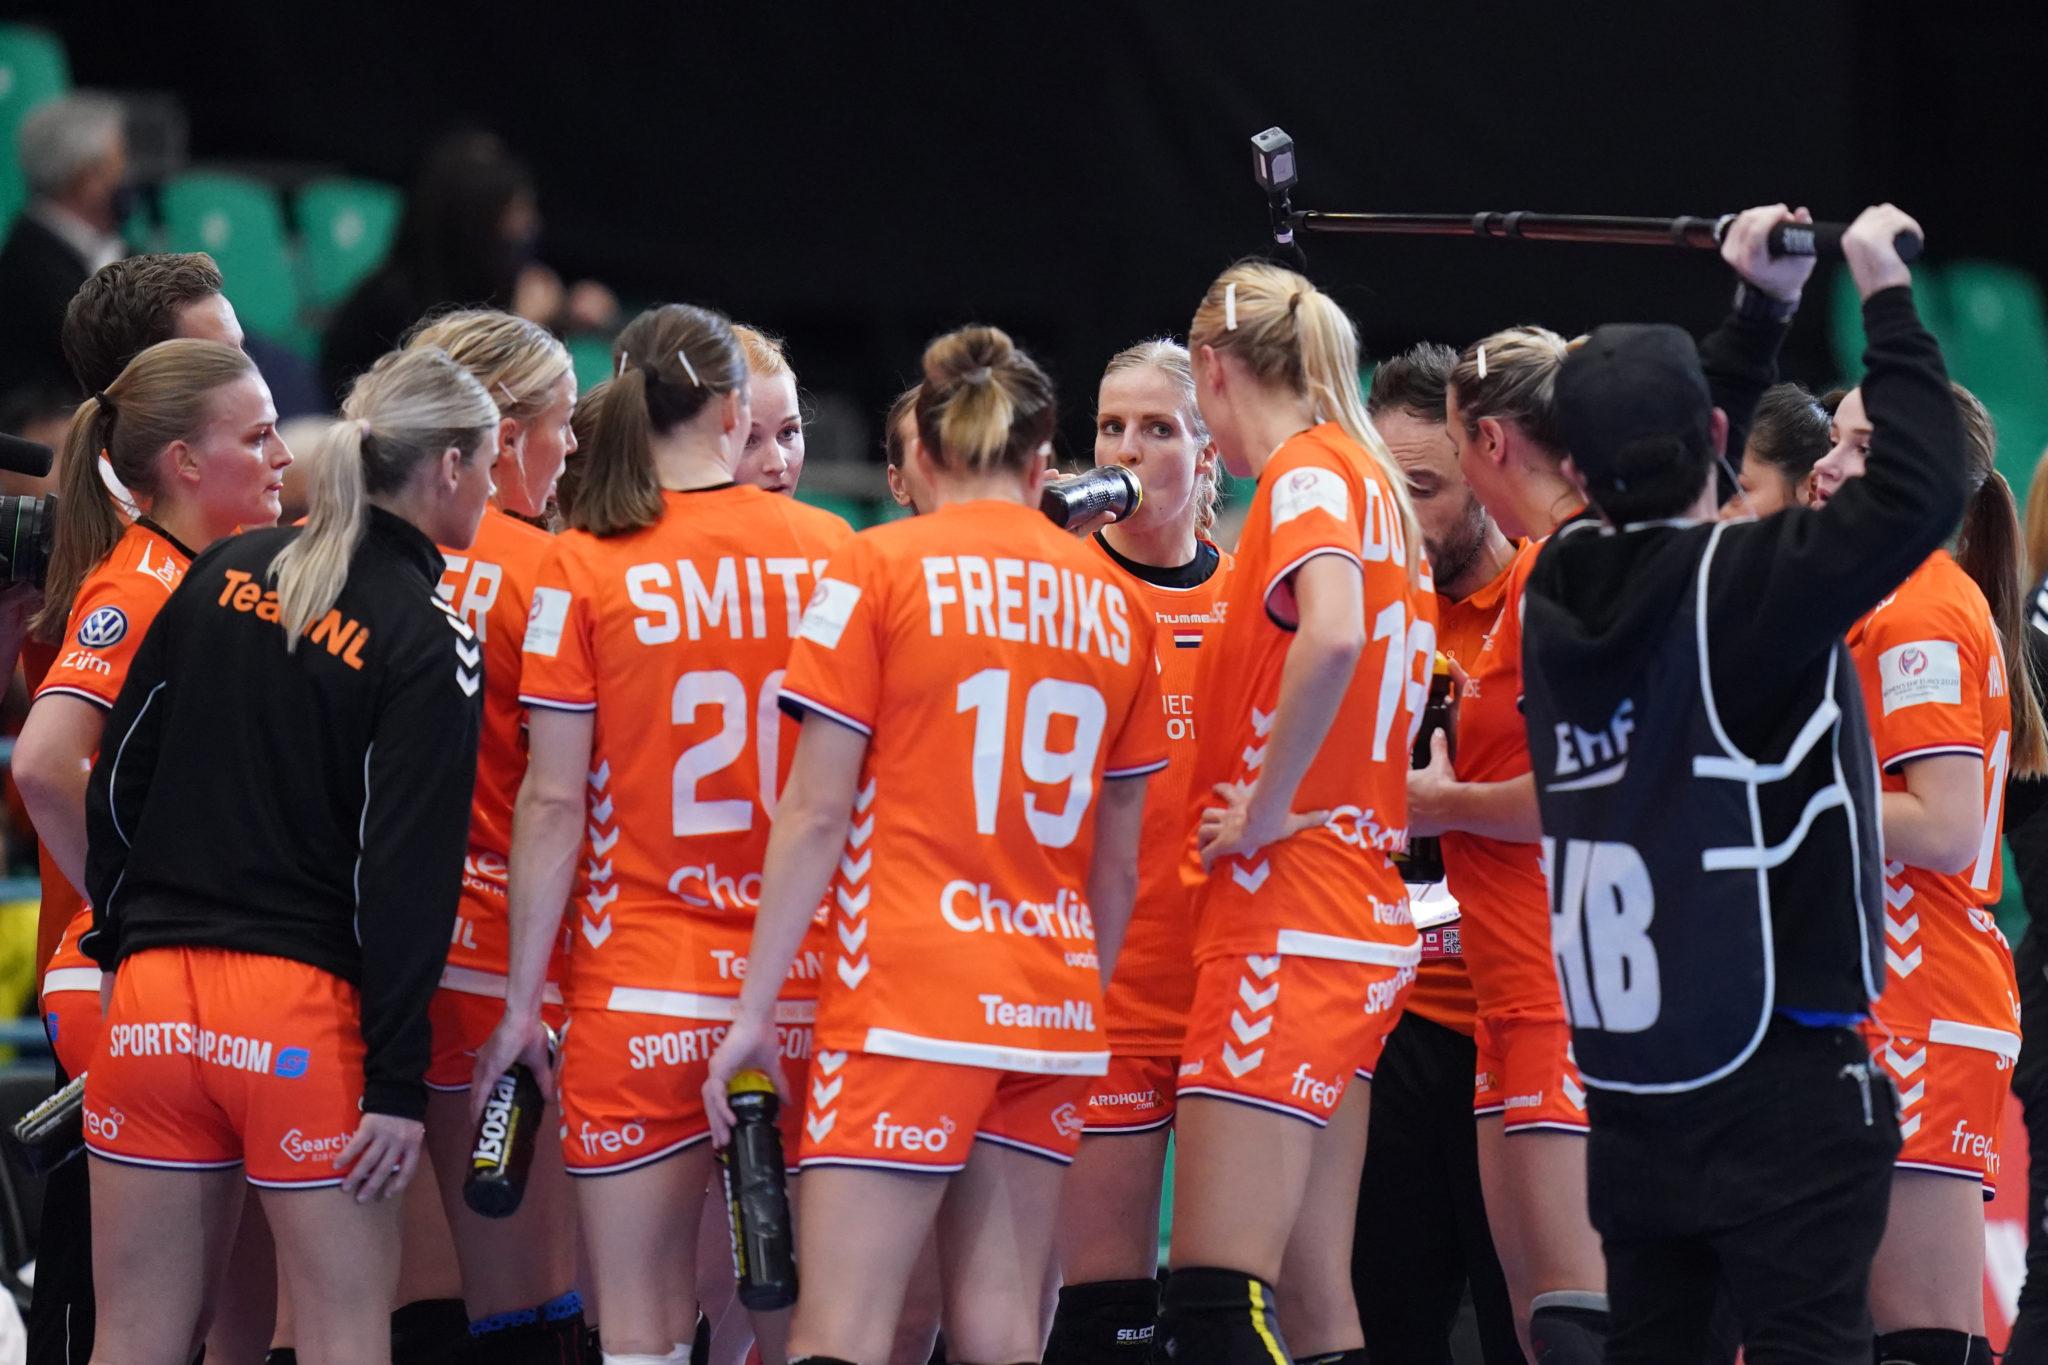 10-12-2020 HANDBAL:NEDERLAND-NOORWEGEN:KOLDEN EURO 2020 Dames EK Handbal In Denemarken Nederland-Noorwegen Danick Snelder #10 Of Netherlands, Timeout